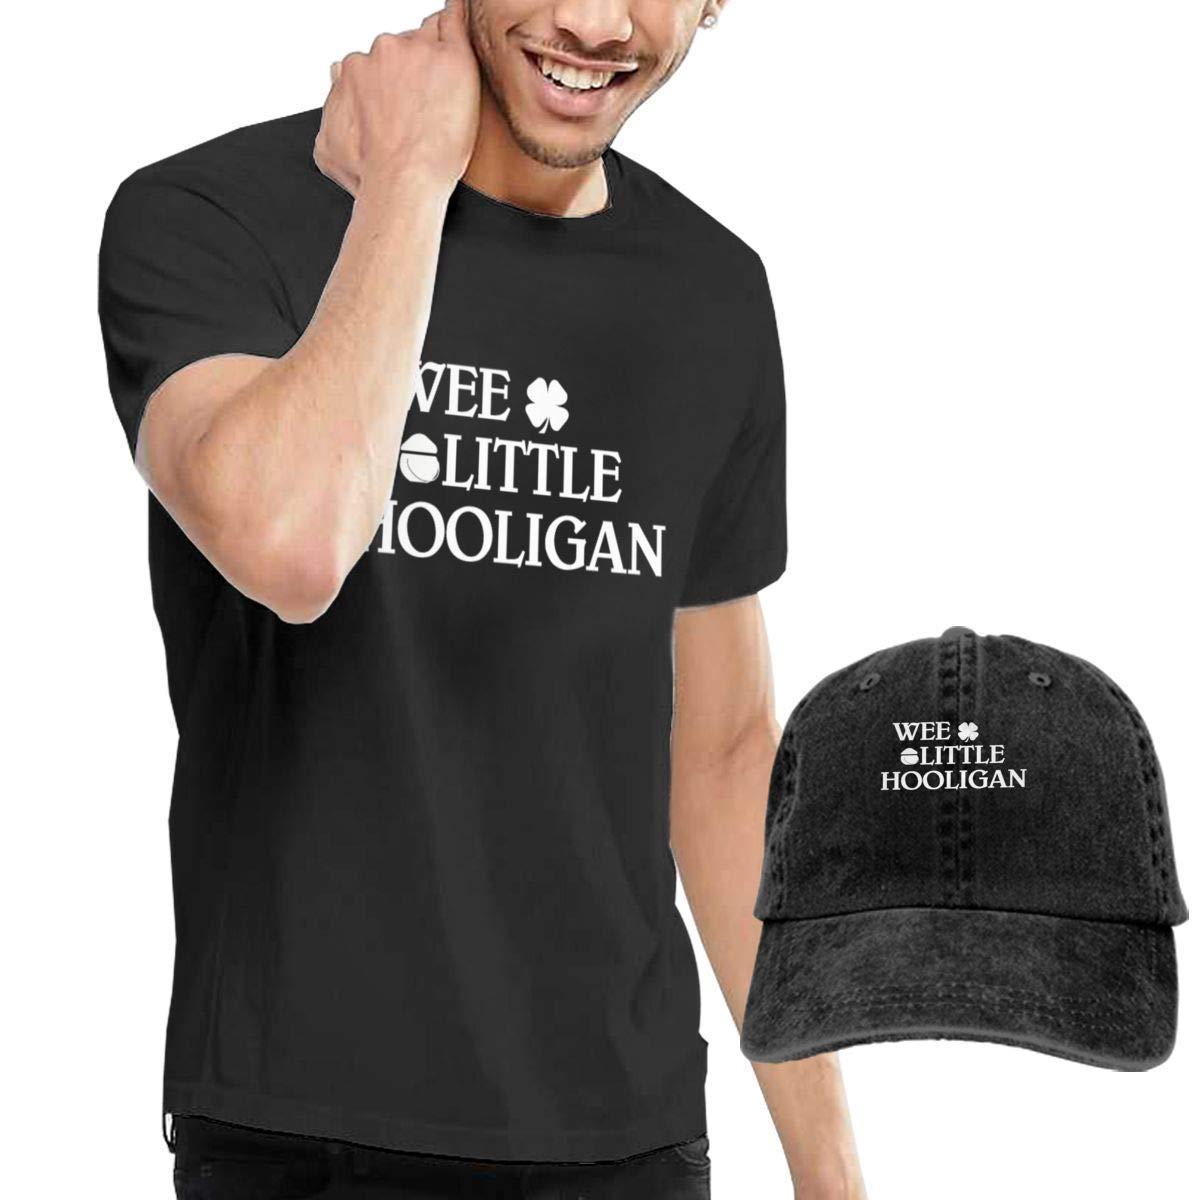 QQWBB Wee Little Hooligan Shirt Short Sleeve Denim Hat Men